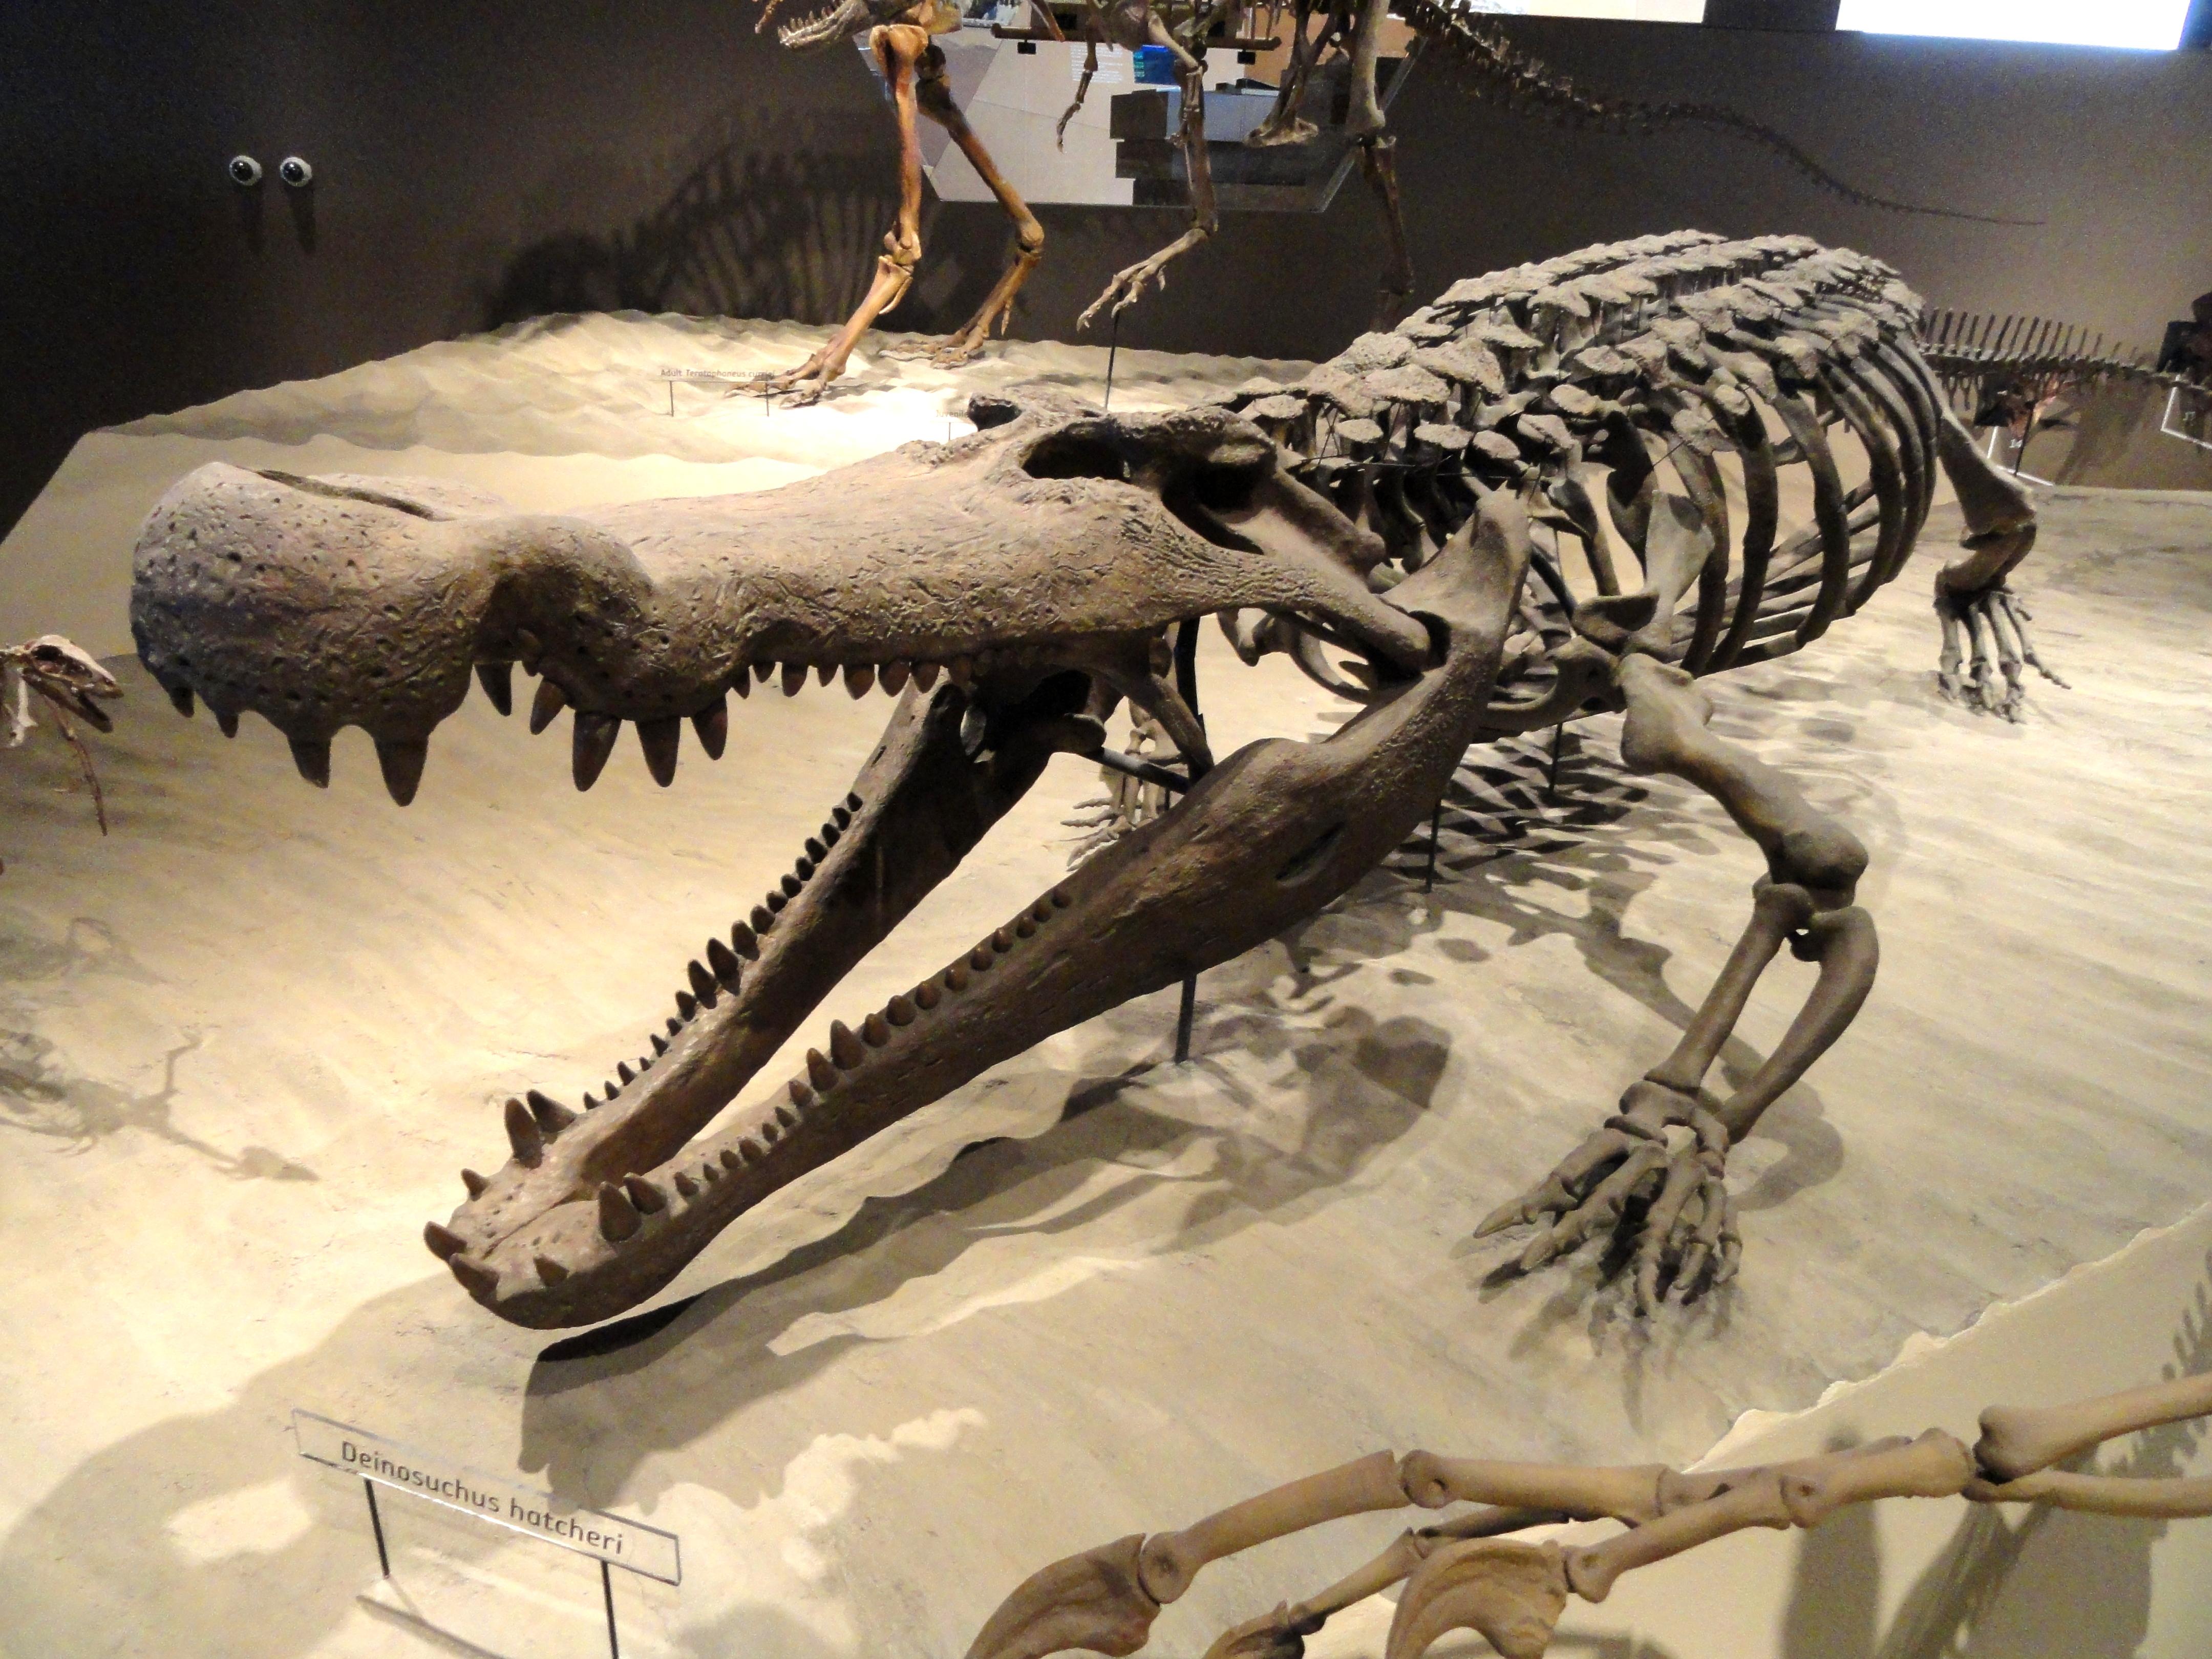 Deinosuchus_hatcheri_-_Natural_History_Museum_of_Utah_-_DSC07251.JPG